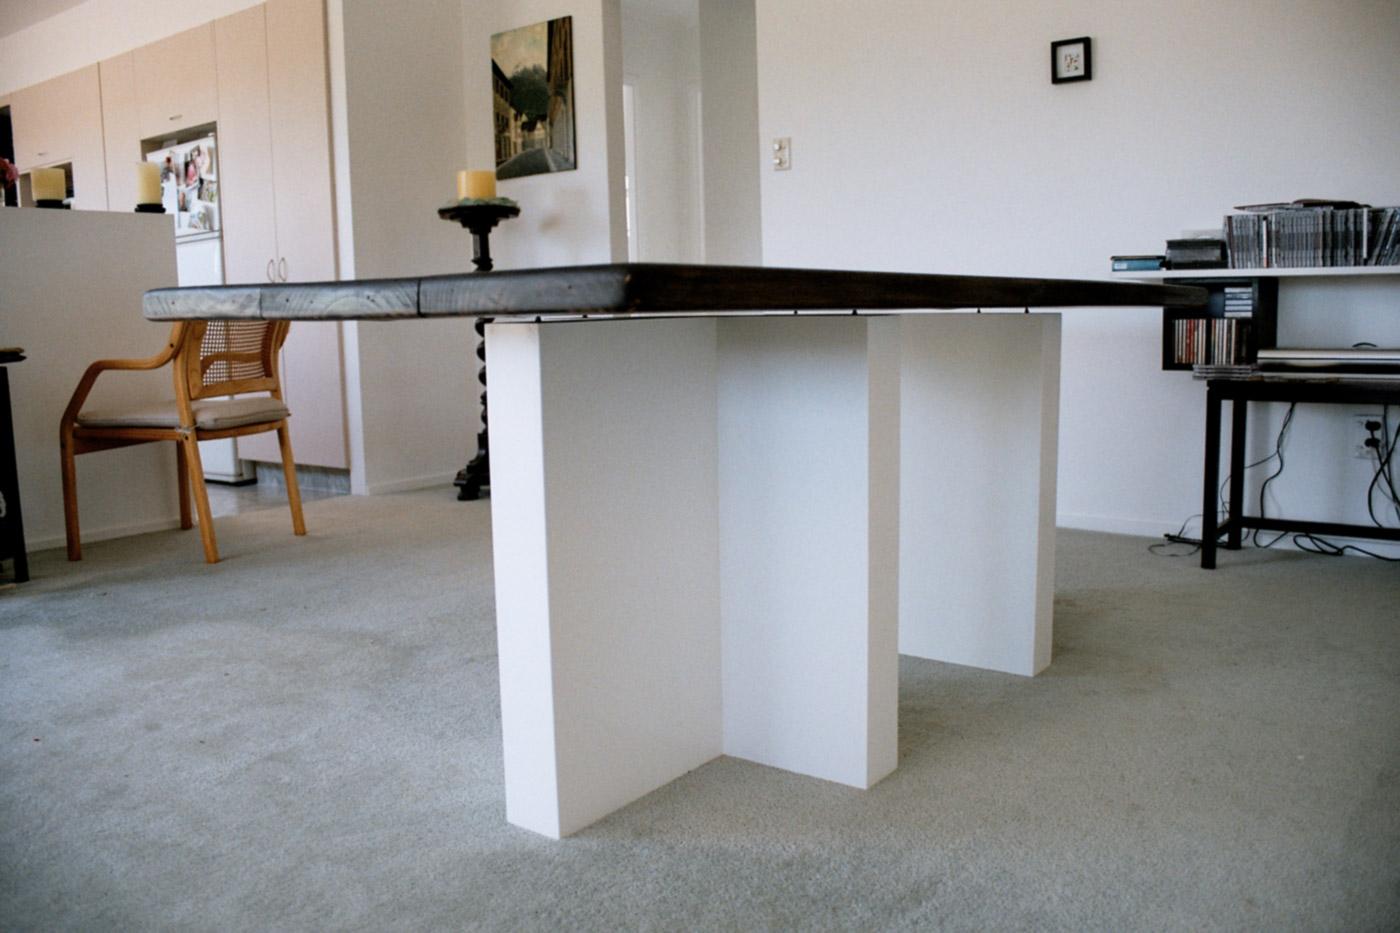 TABLE @ 2003, burned pine wood, plywood, 200 x 100 x 75 cm